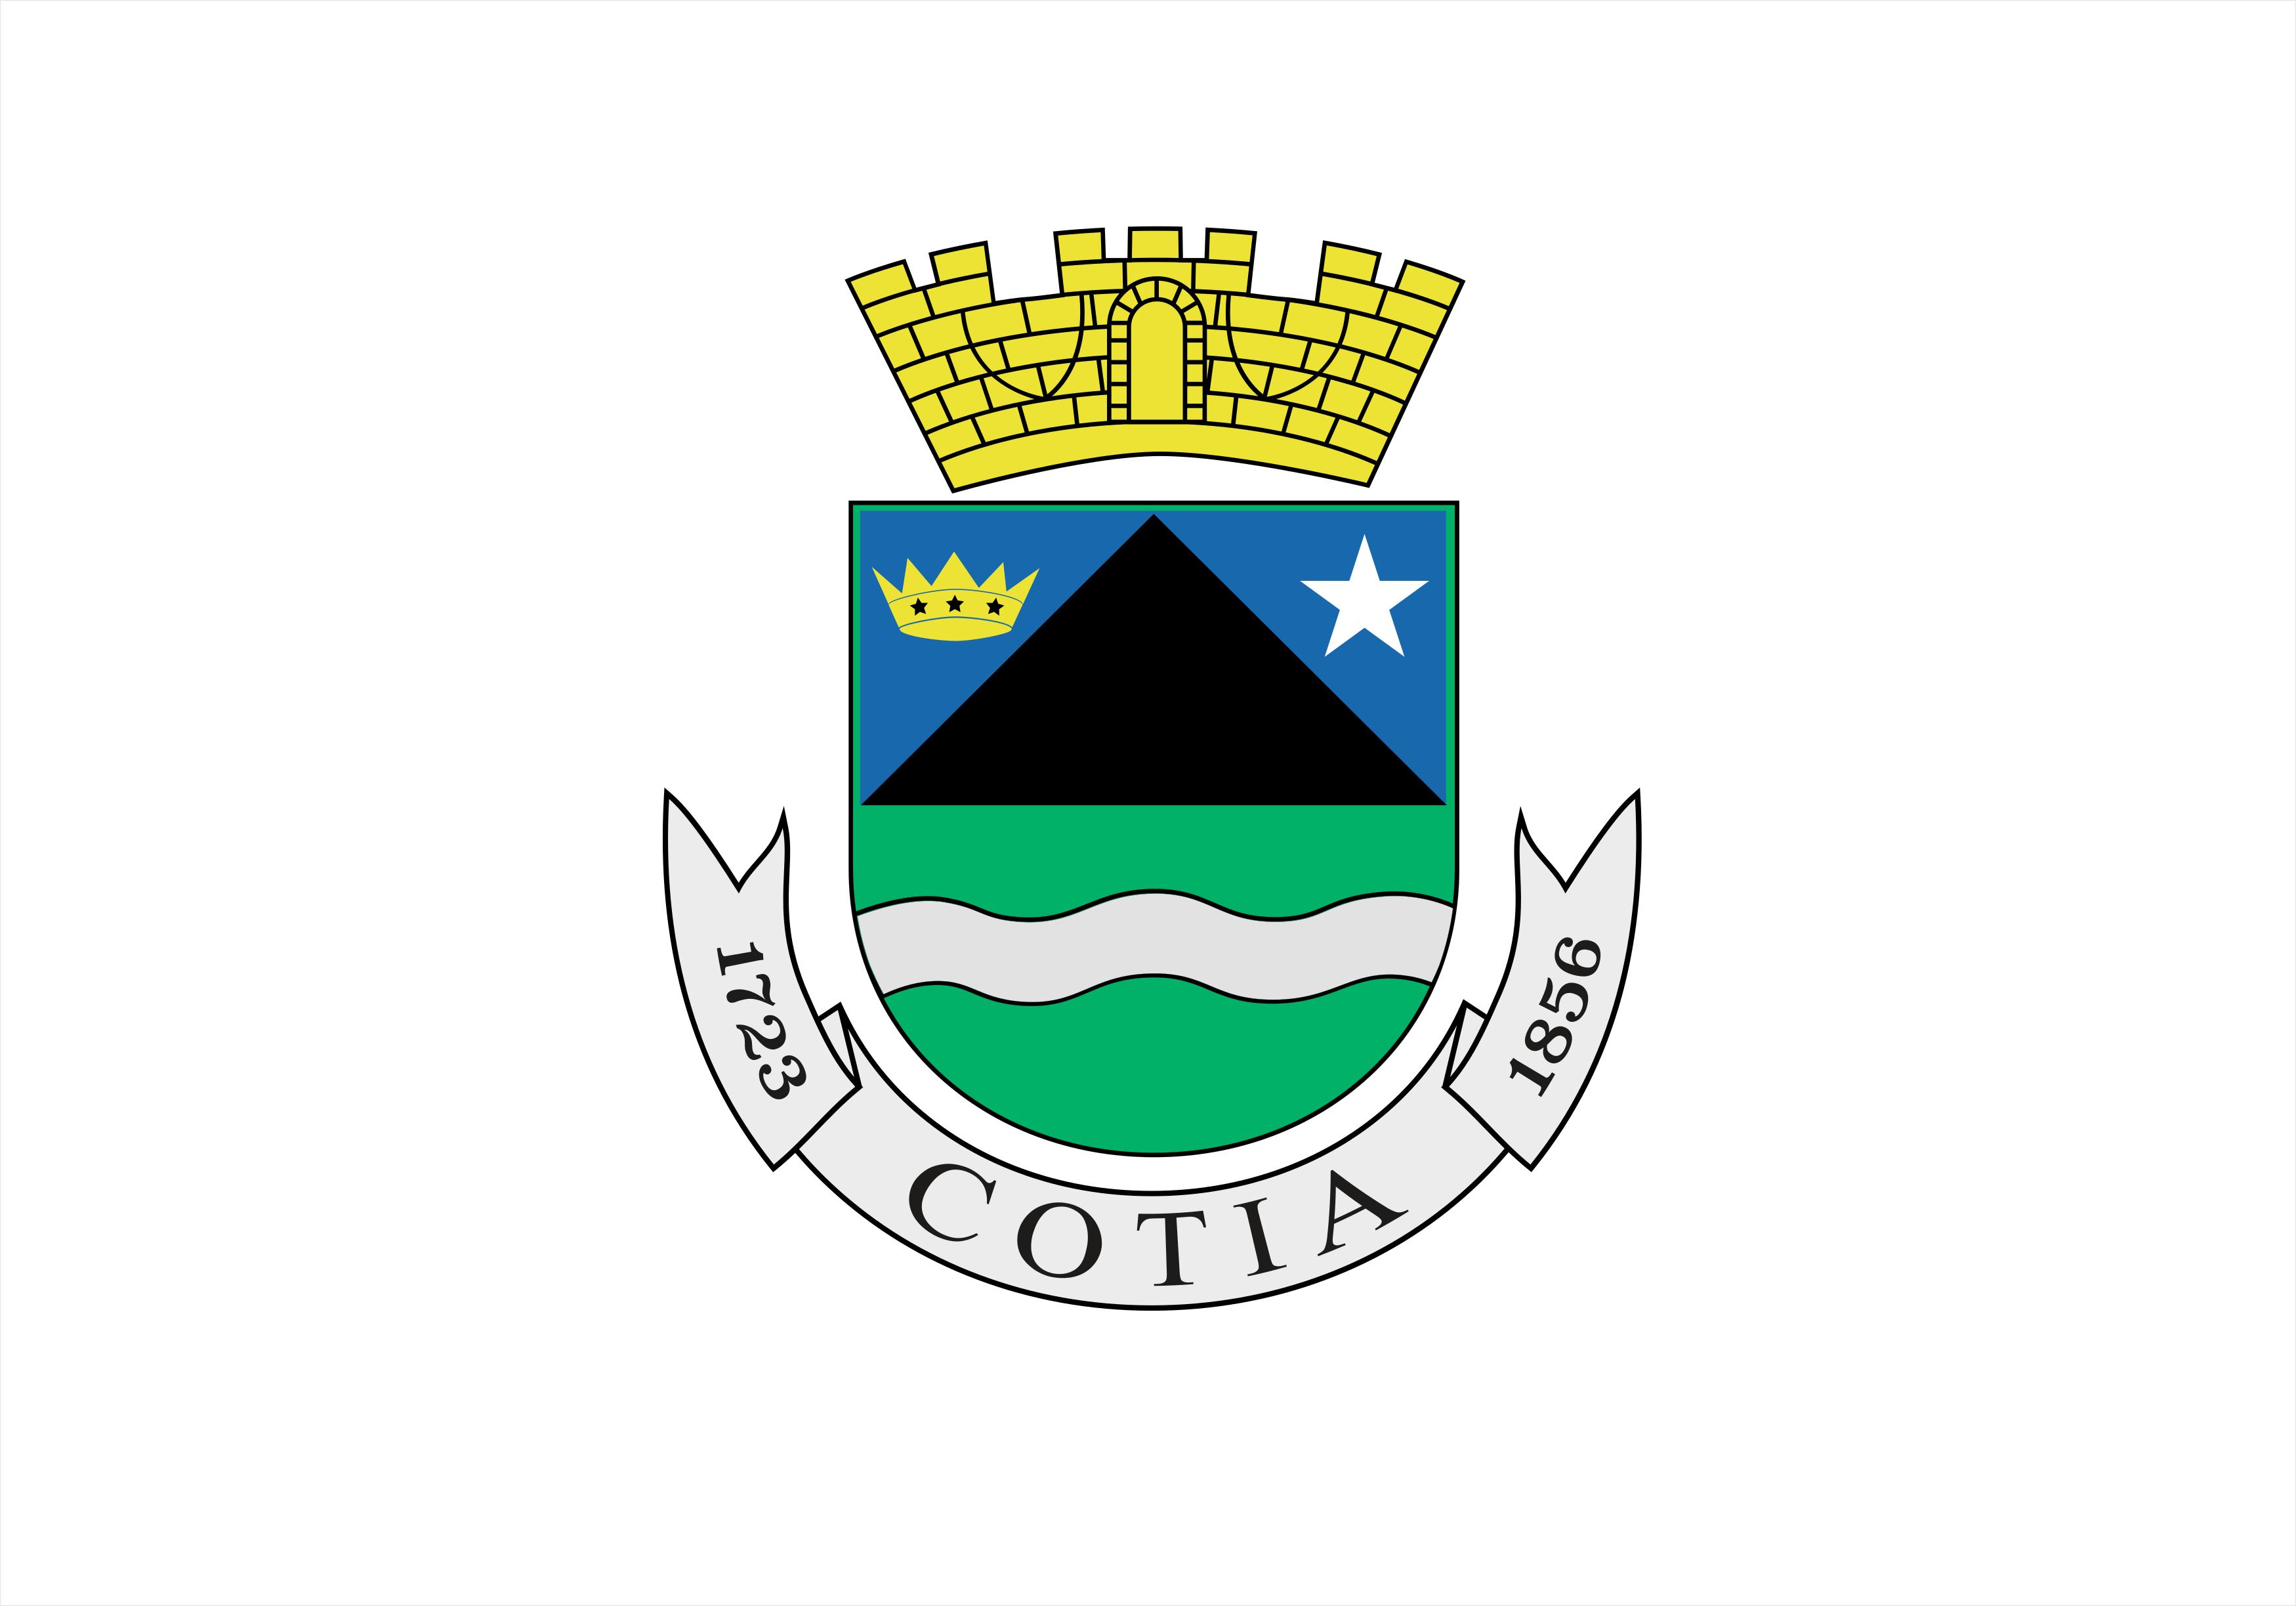 Bandeira da cidade de Cotia SP.